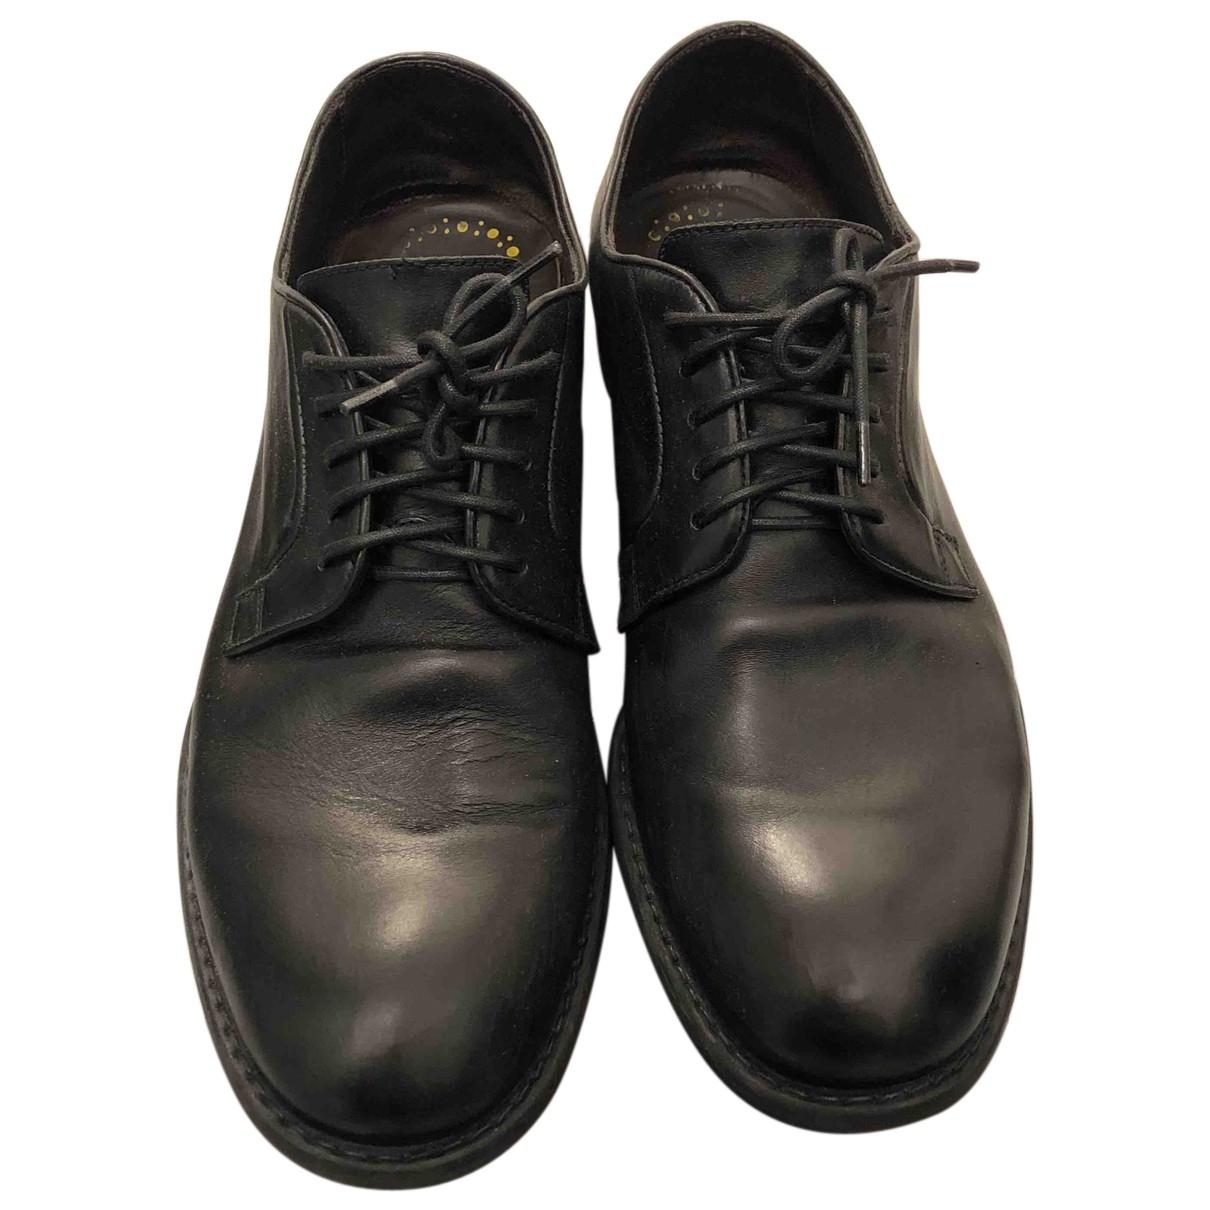 Doucals \N Schnuerschuhe in  Schwarz Leder